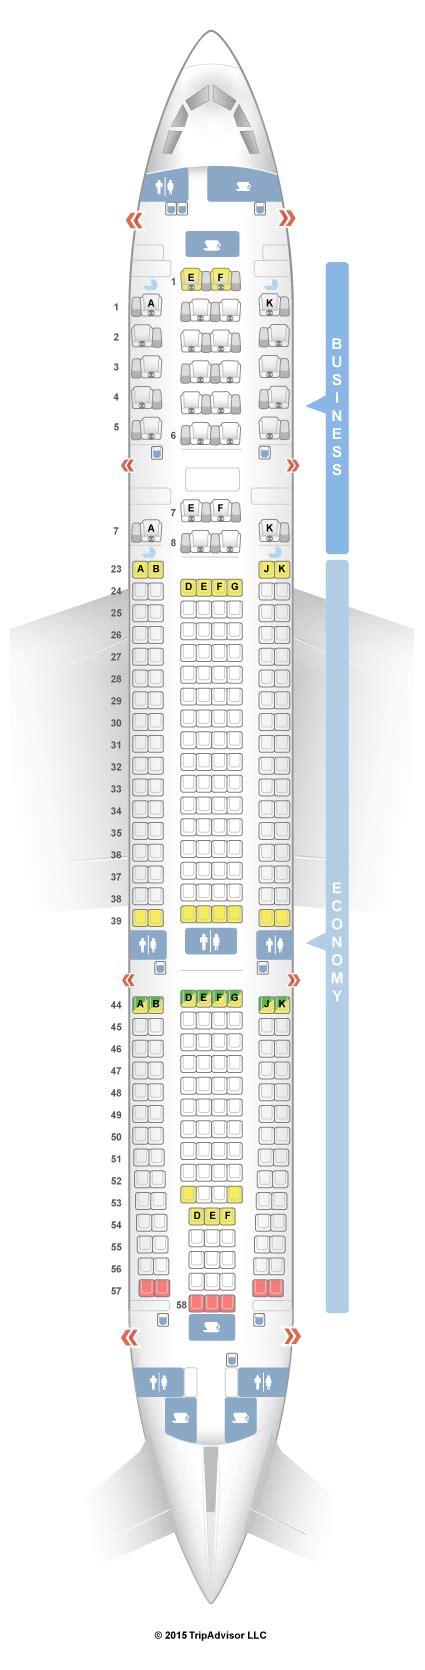 seating guru seatguru seat map qantas airbus a330 200 332 domestic